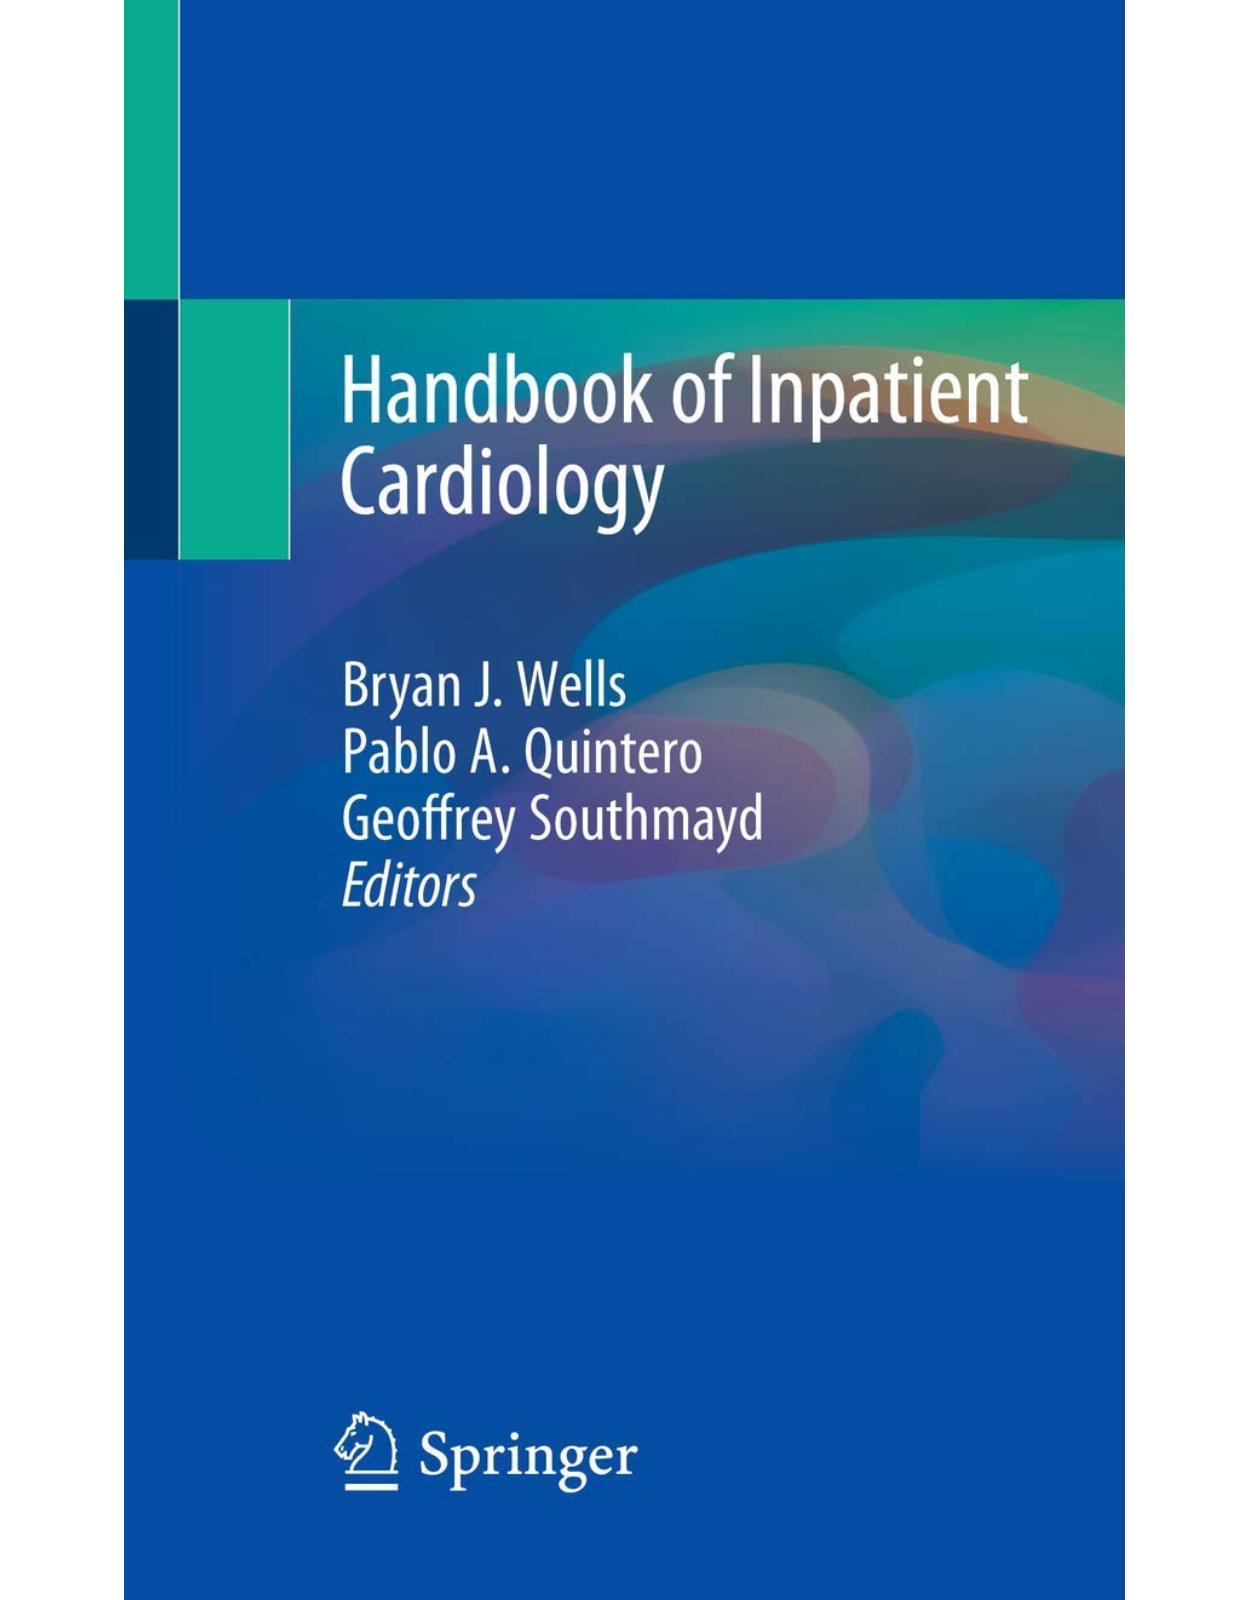 Handbook of Inpatient Cardiology